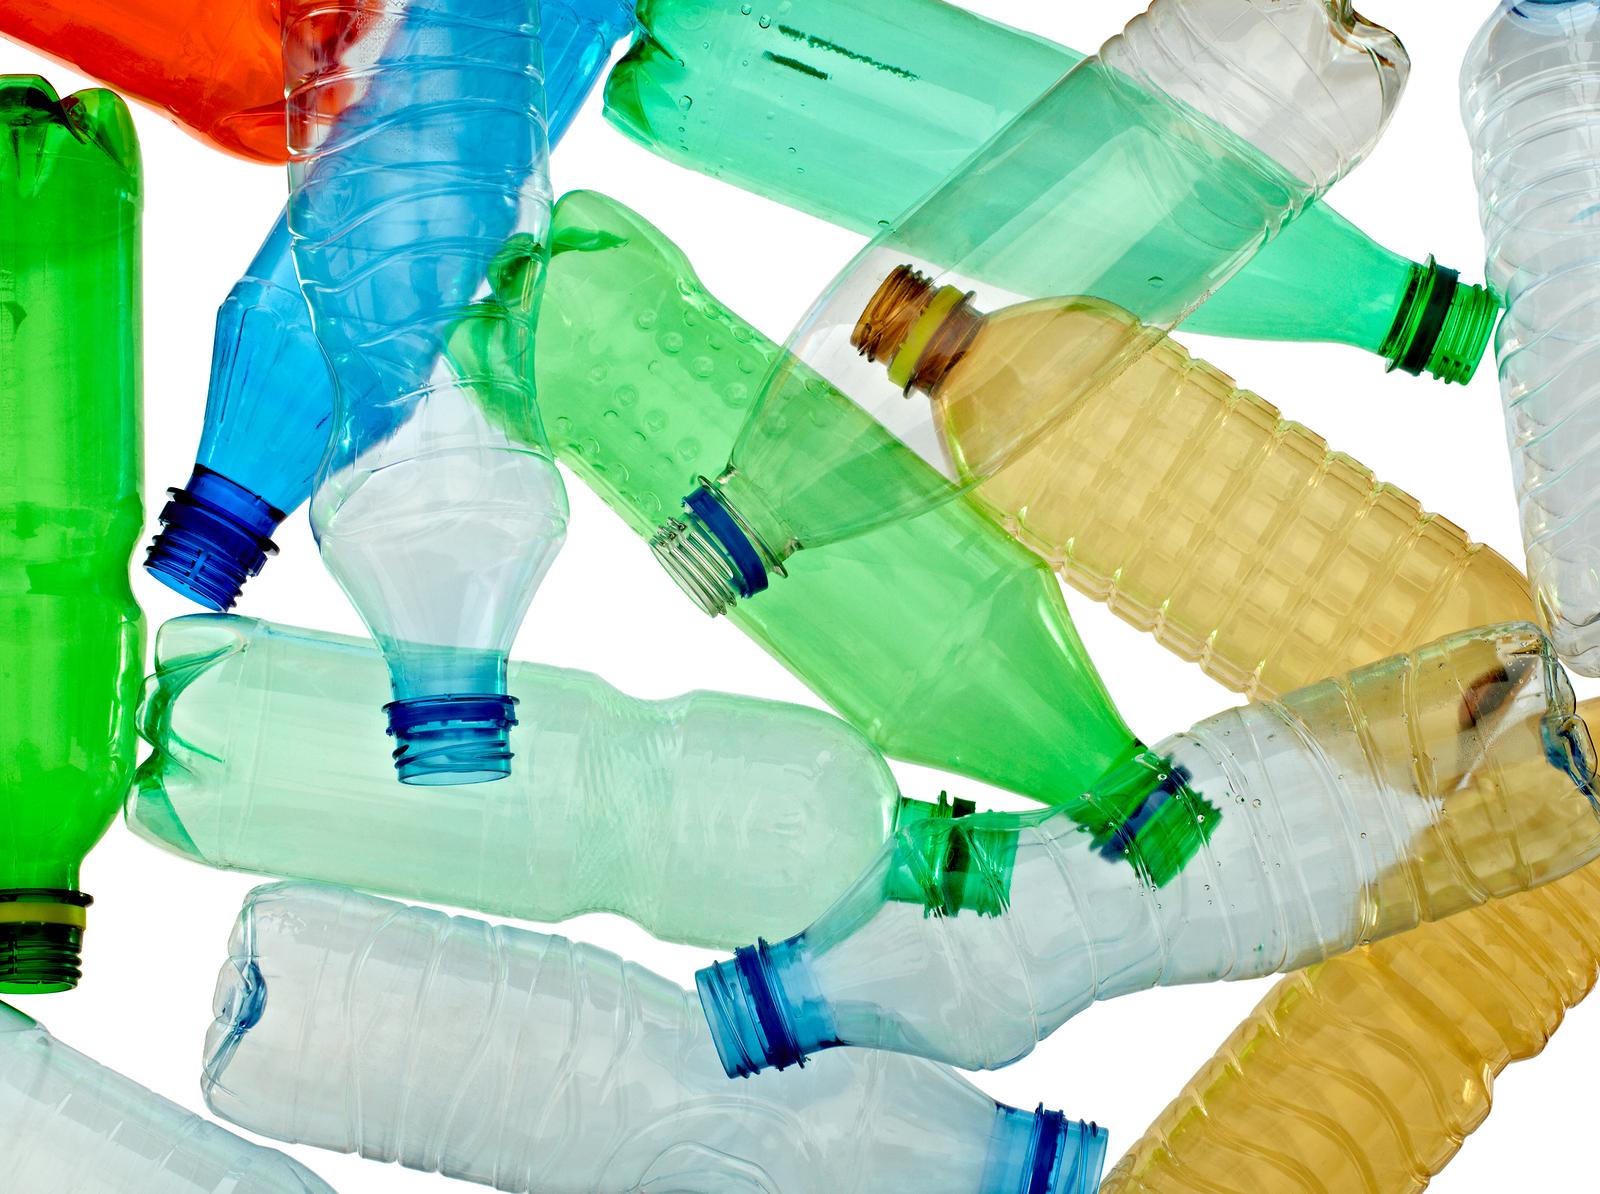 bigstock-empty-used-trash-bottle-ecolog-38414176.jpg